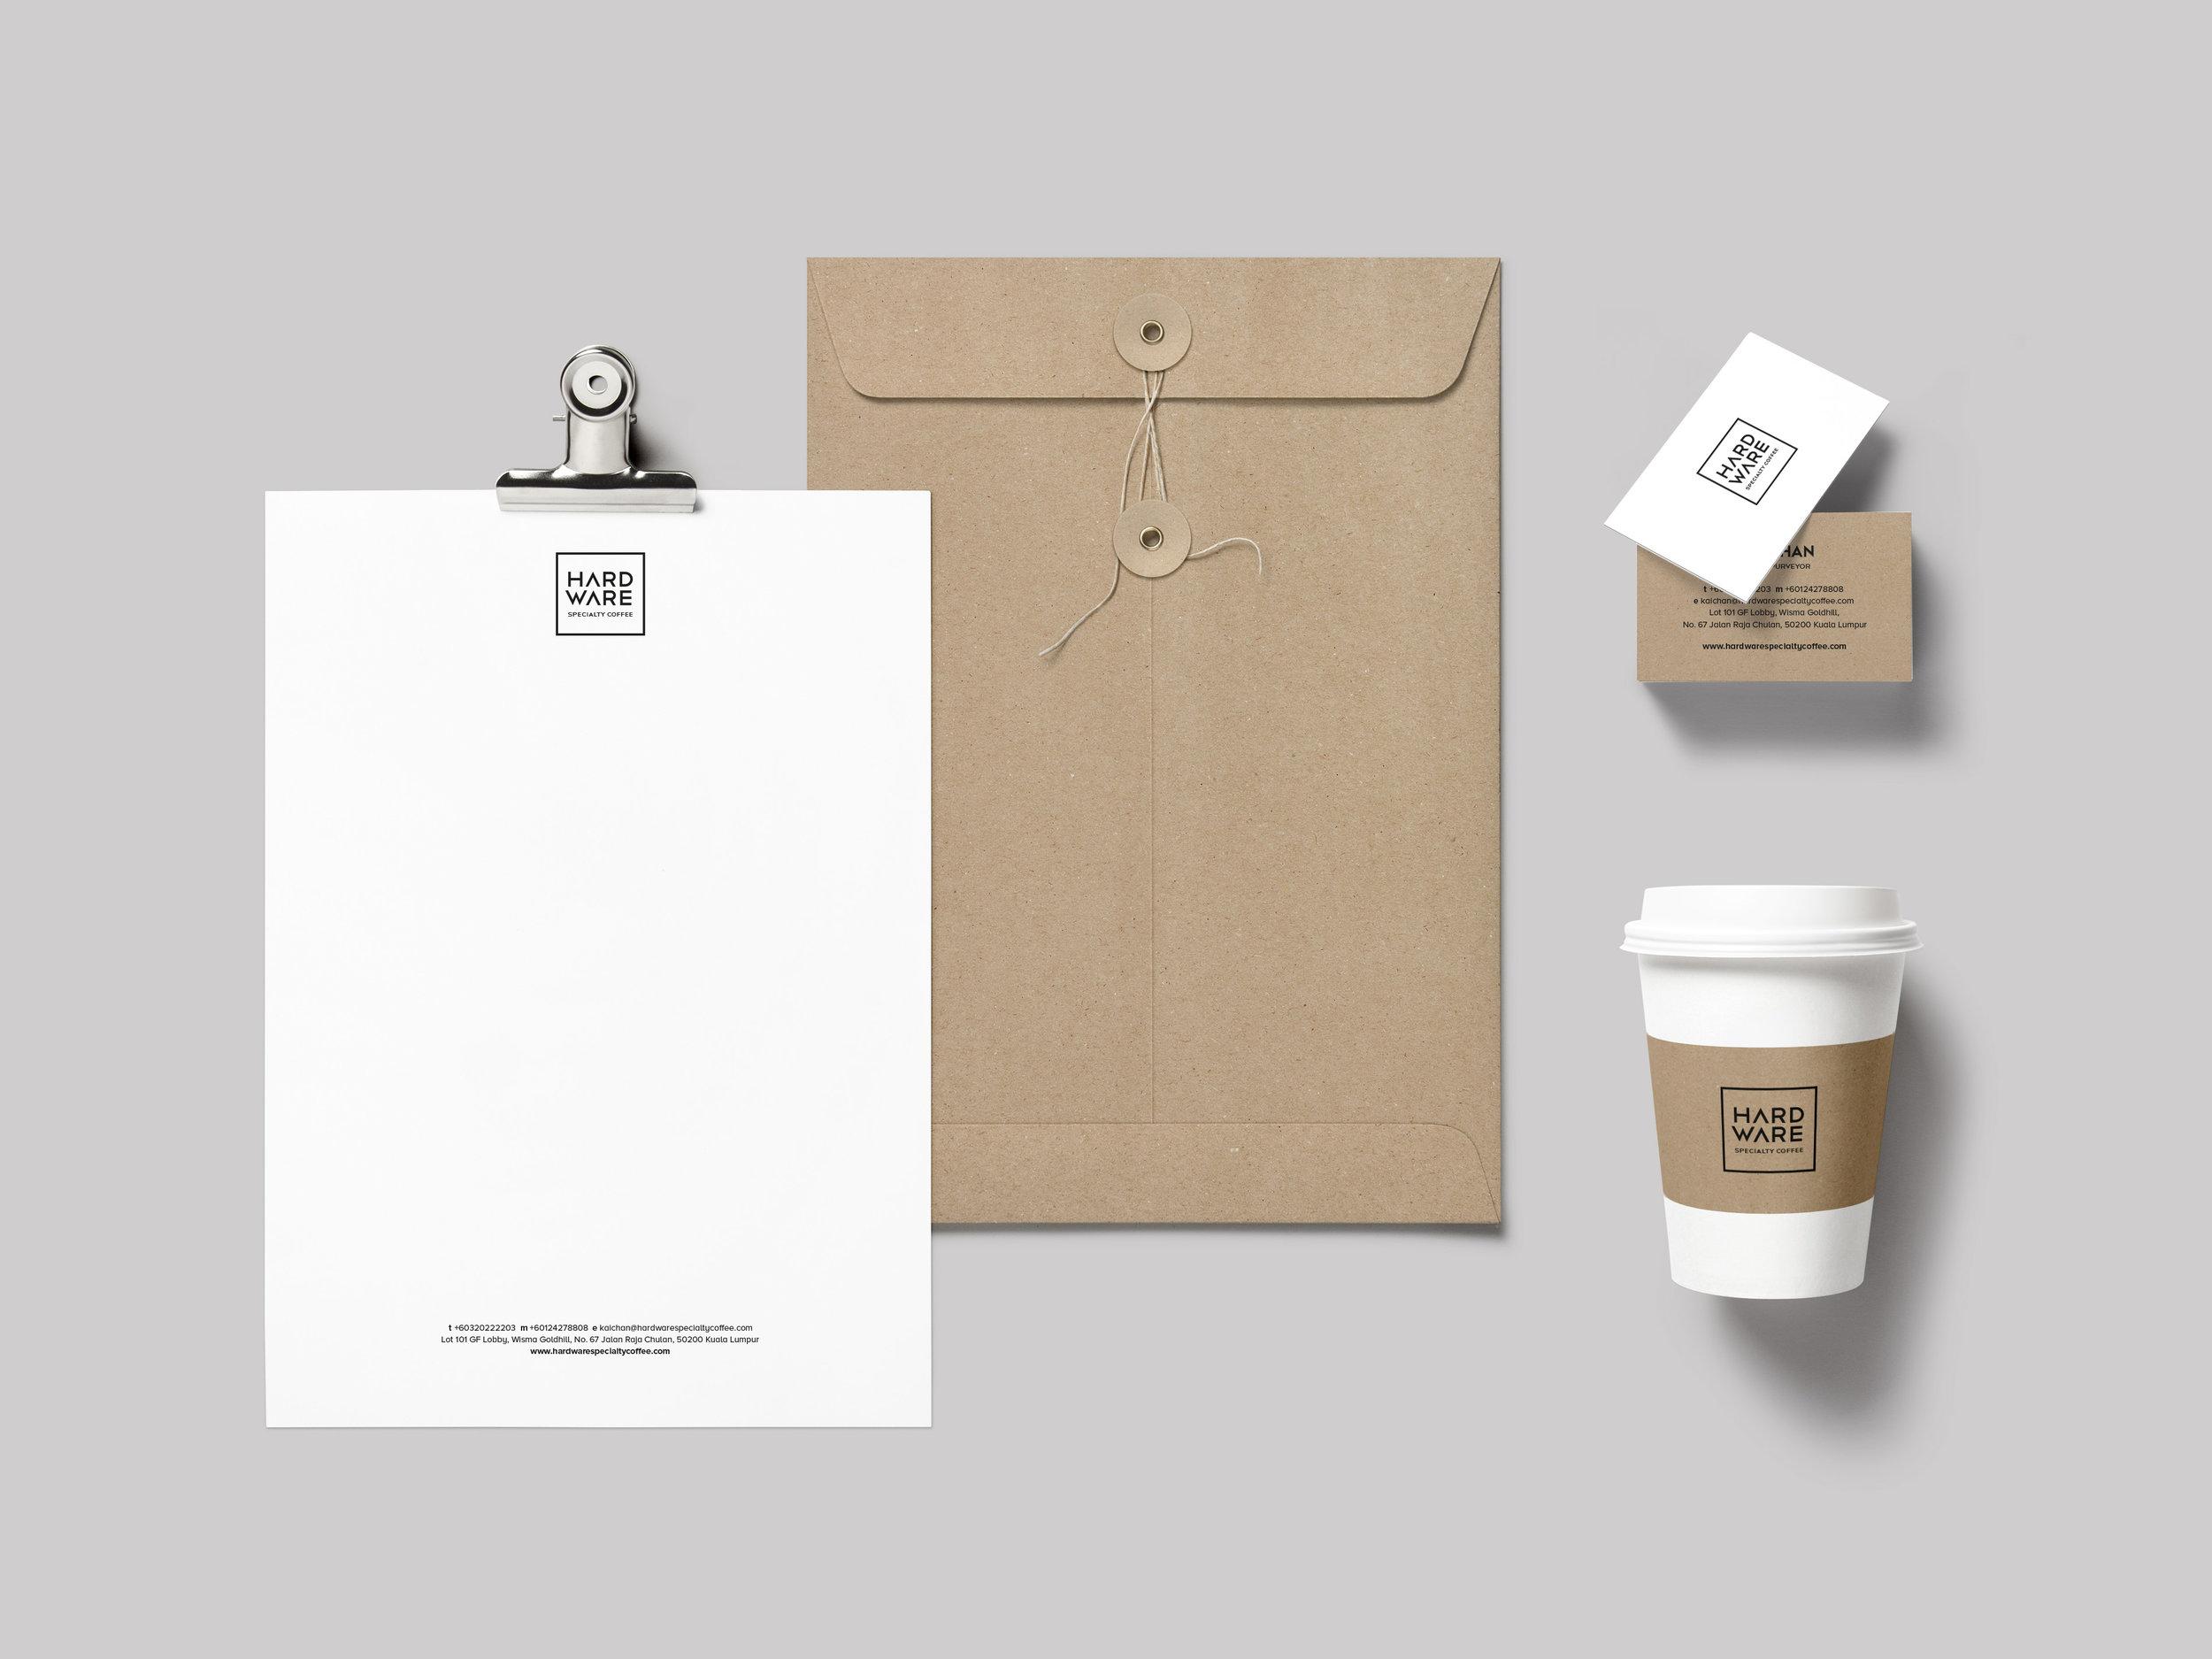 02 Hardware Coffee Branding Identity-Design-Namecard-letterhead-envelope-cup design.jpg